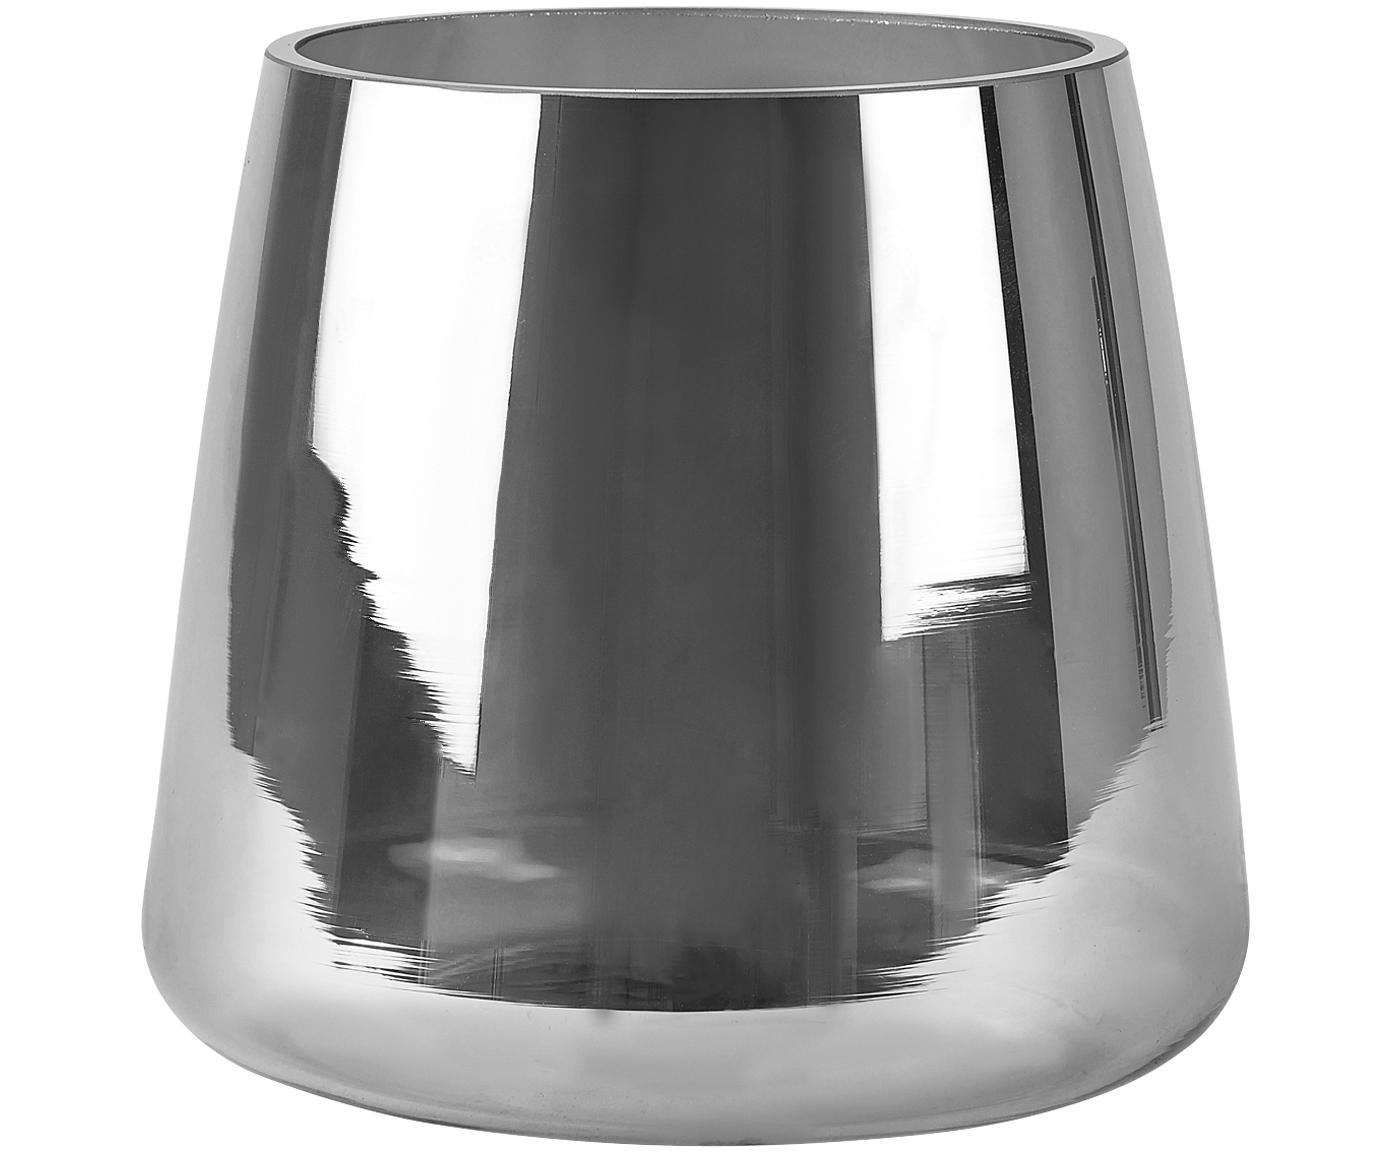 Glazen vaas Carina, Glas, Zilverkleurig, transparant, Ø 18 x H 16 cm